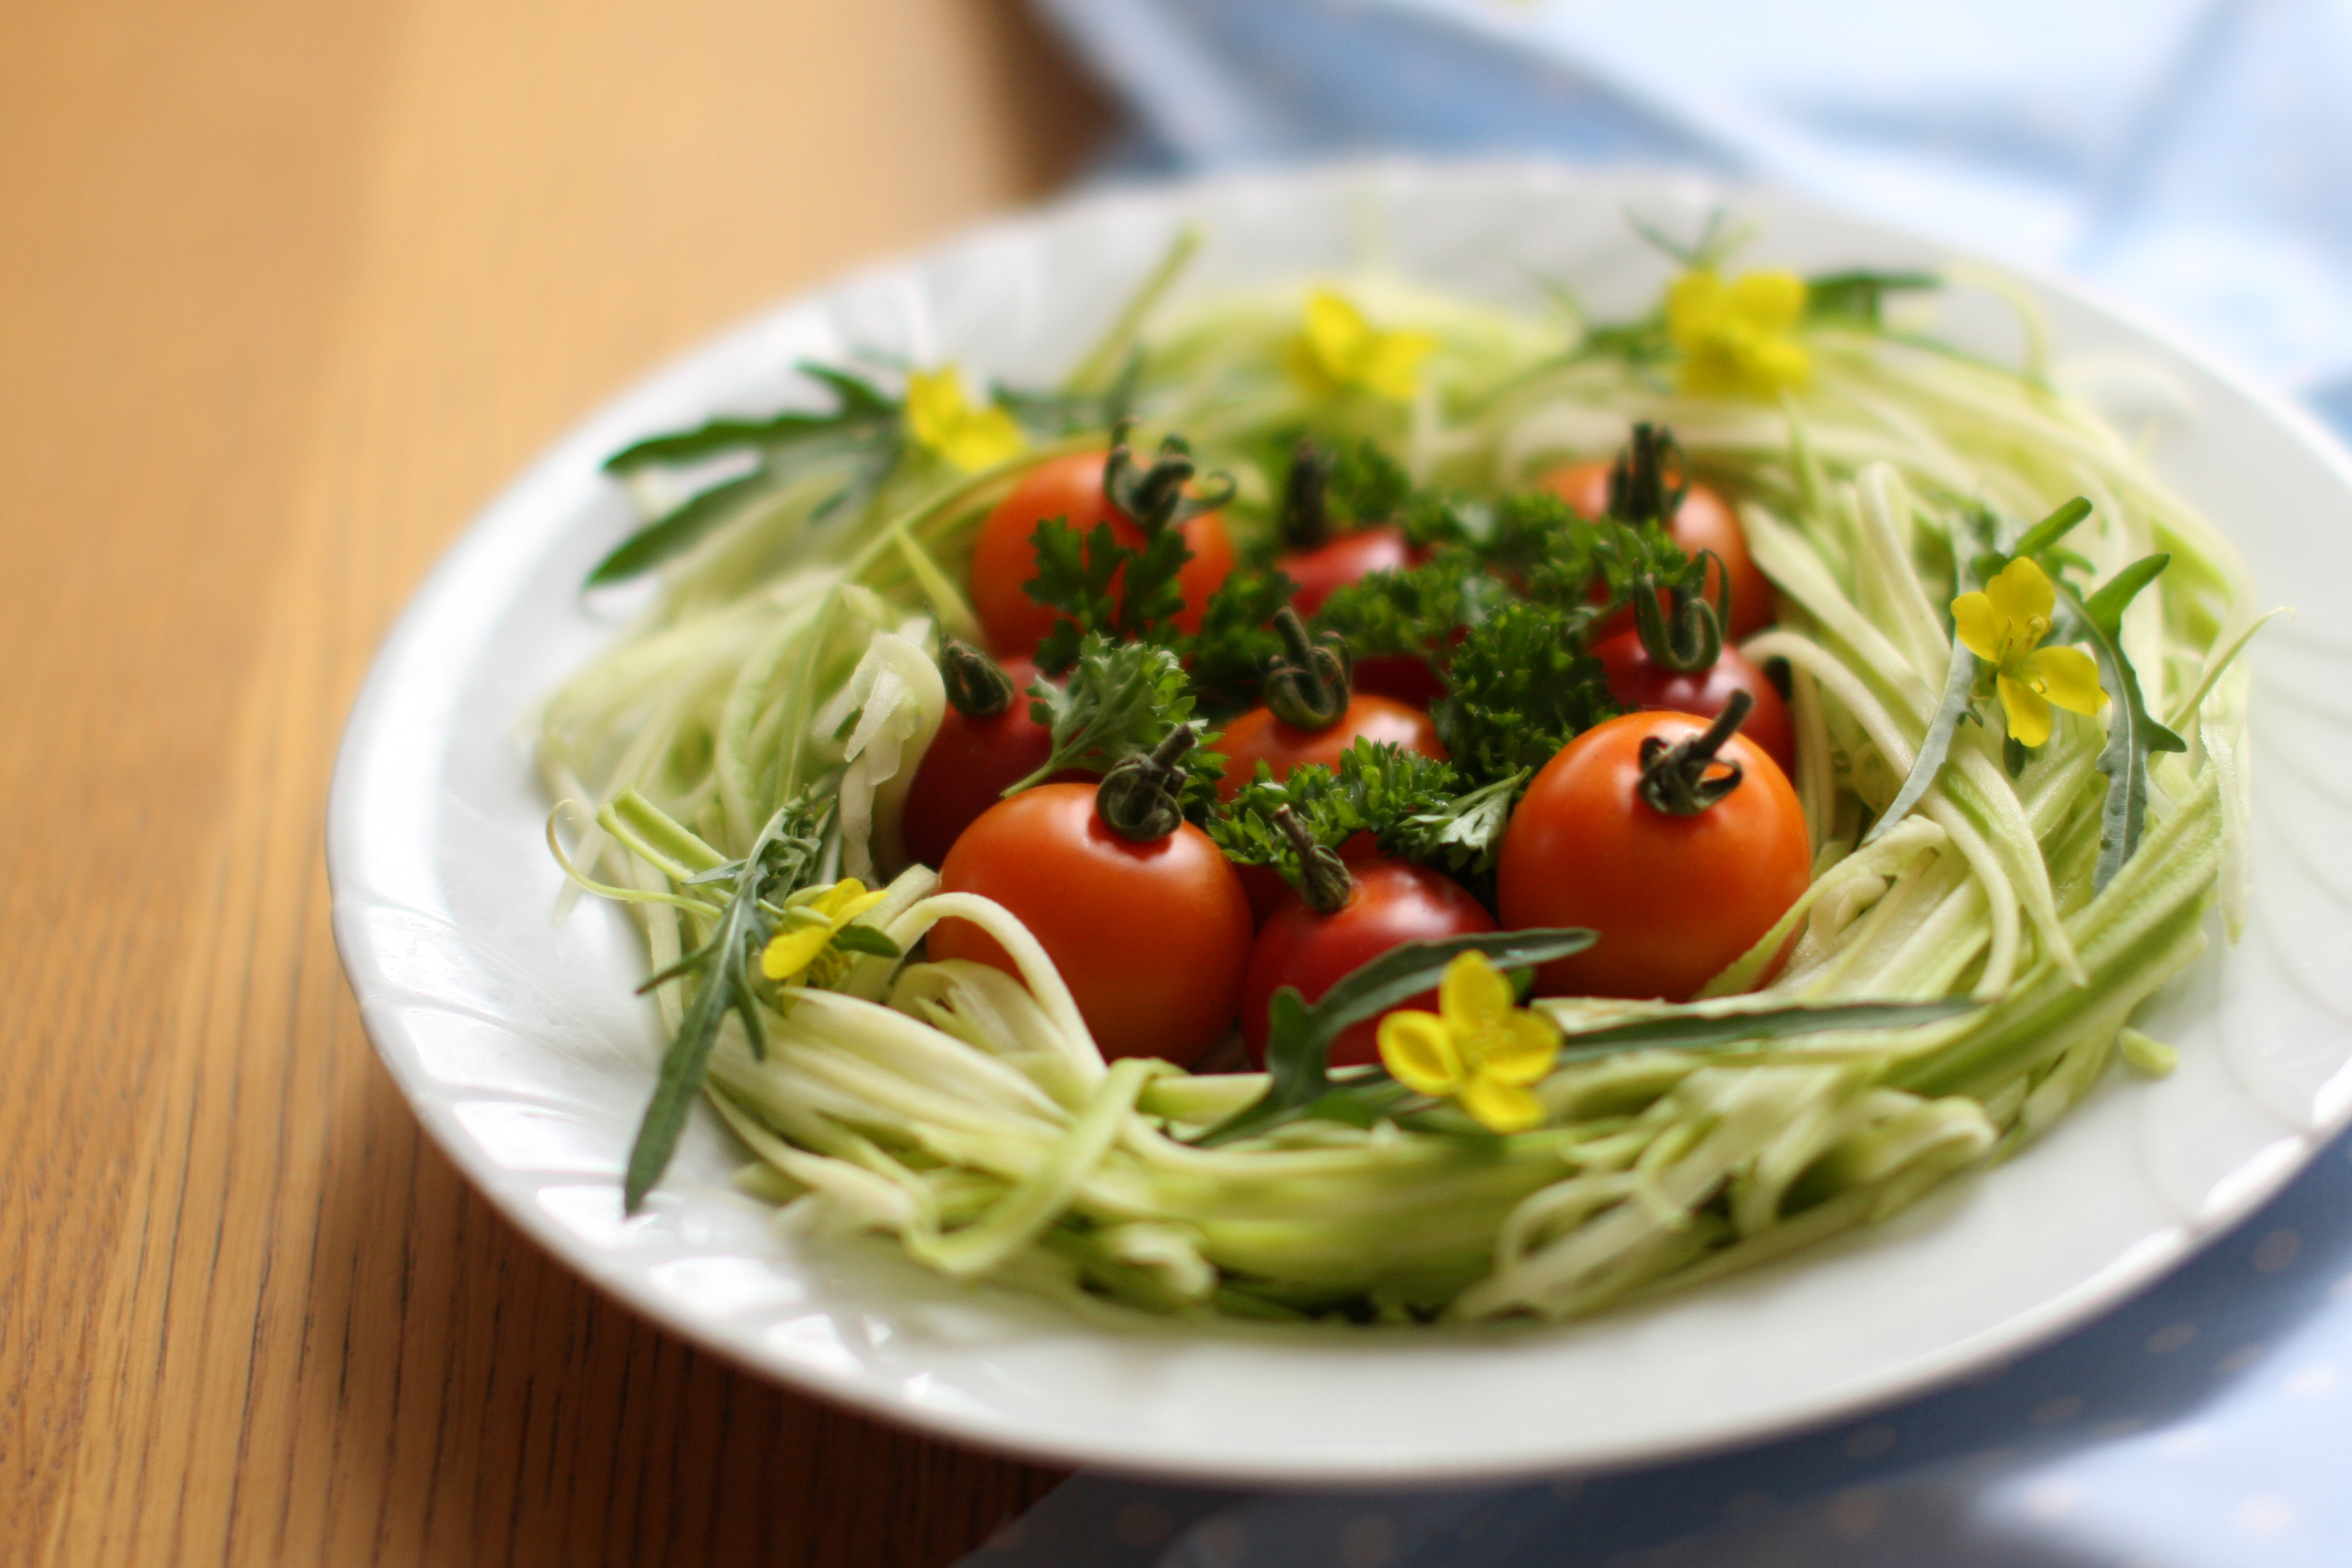 Salade de spaghetti de courgettes et tomates - delimoon.com